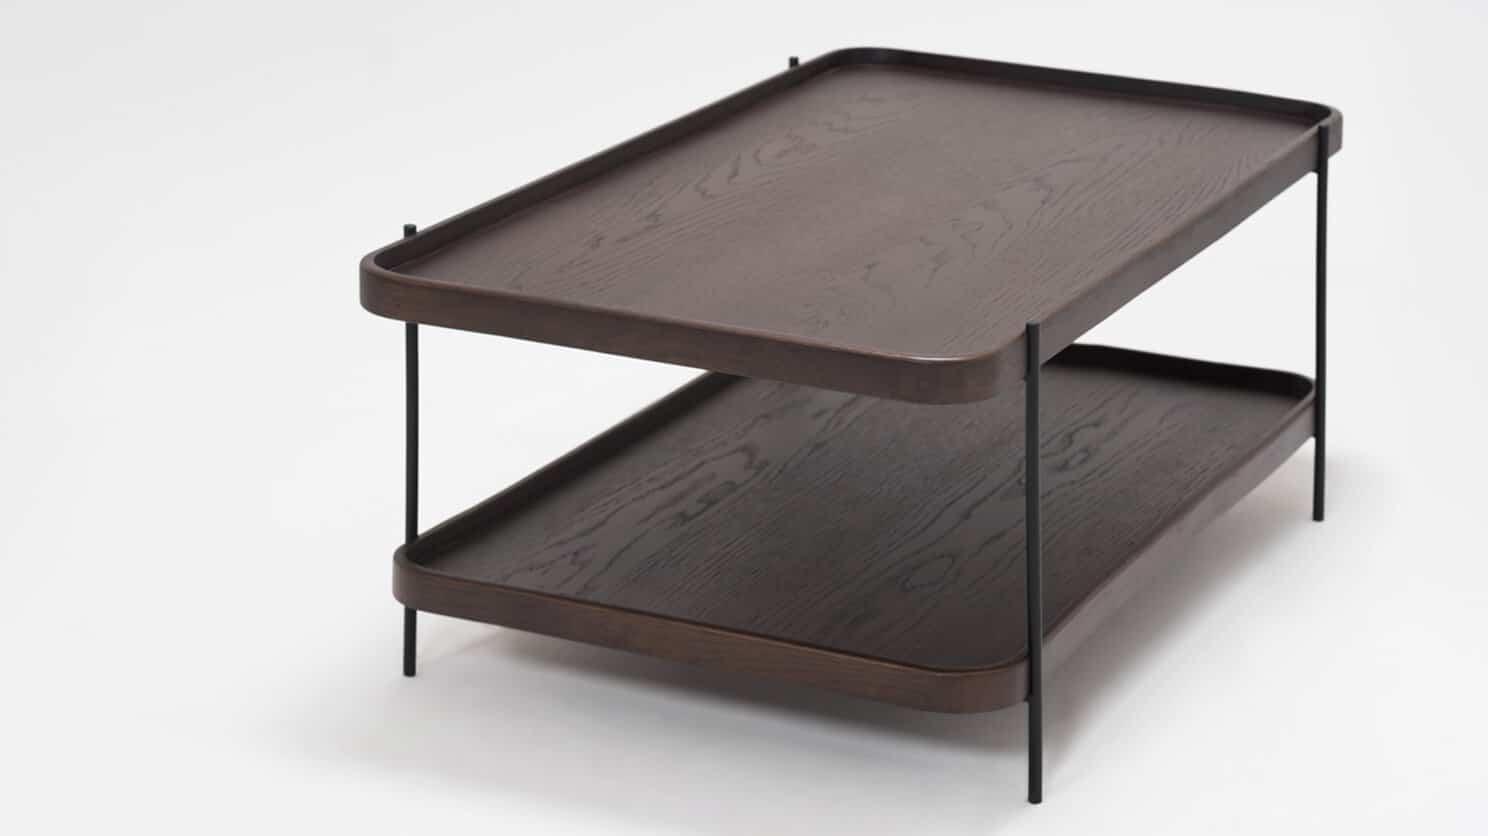 3020 419 17 2 coffee tables sage rectangular coffee table smoked oak detail 02